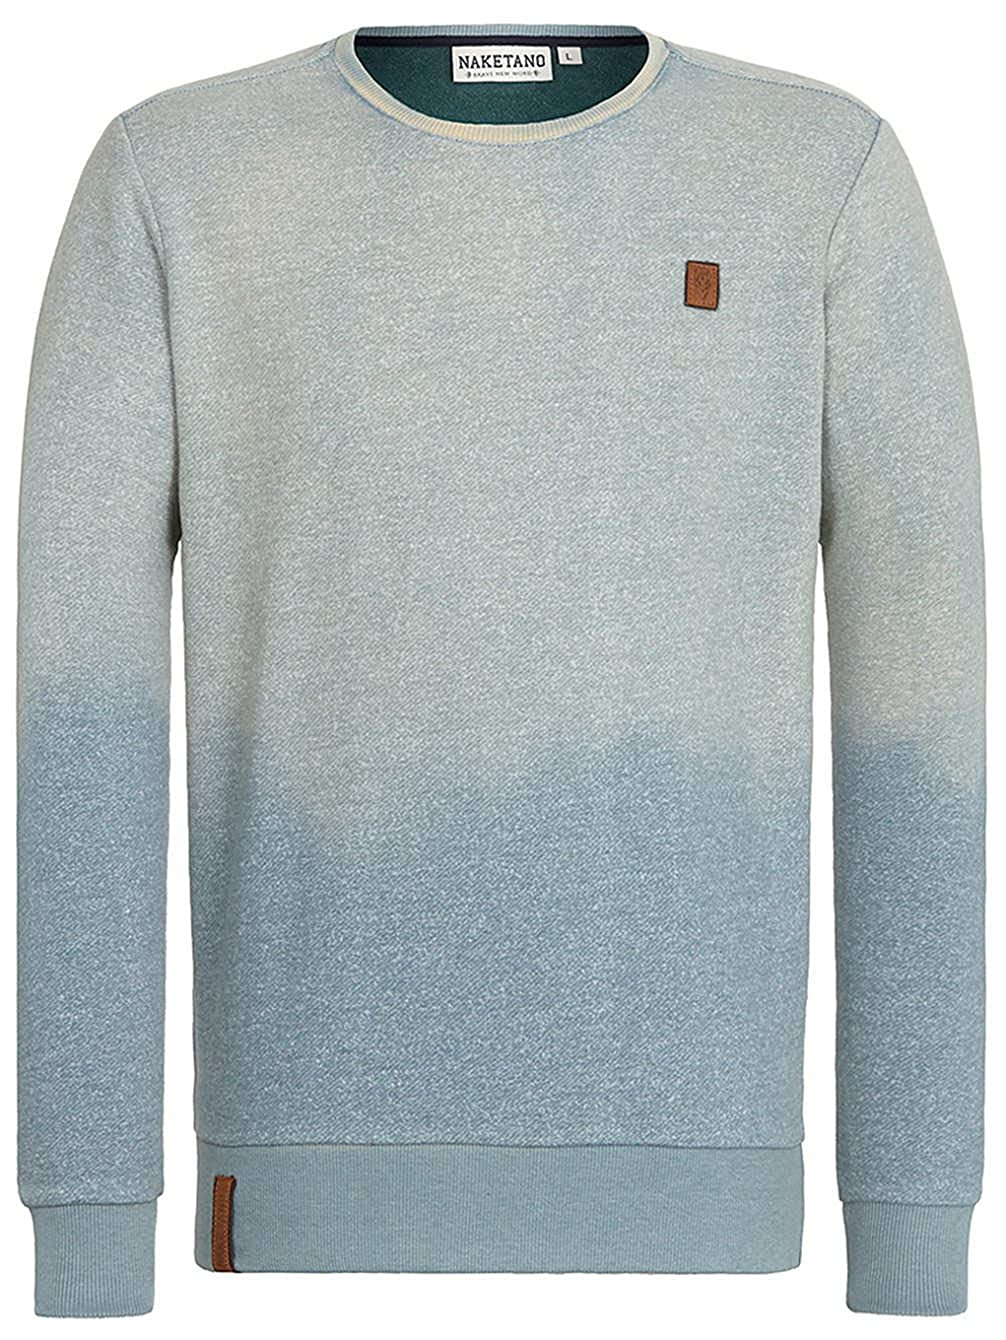 Naketano Herren Sweater Tadellos Abgespritzt Sweater